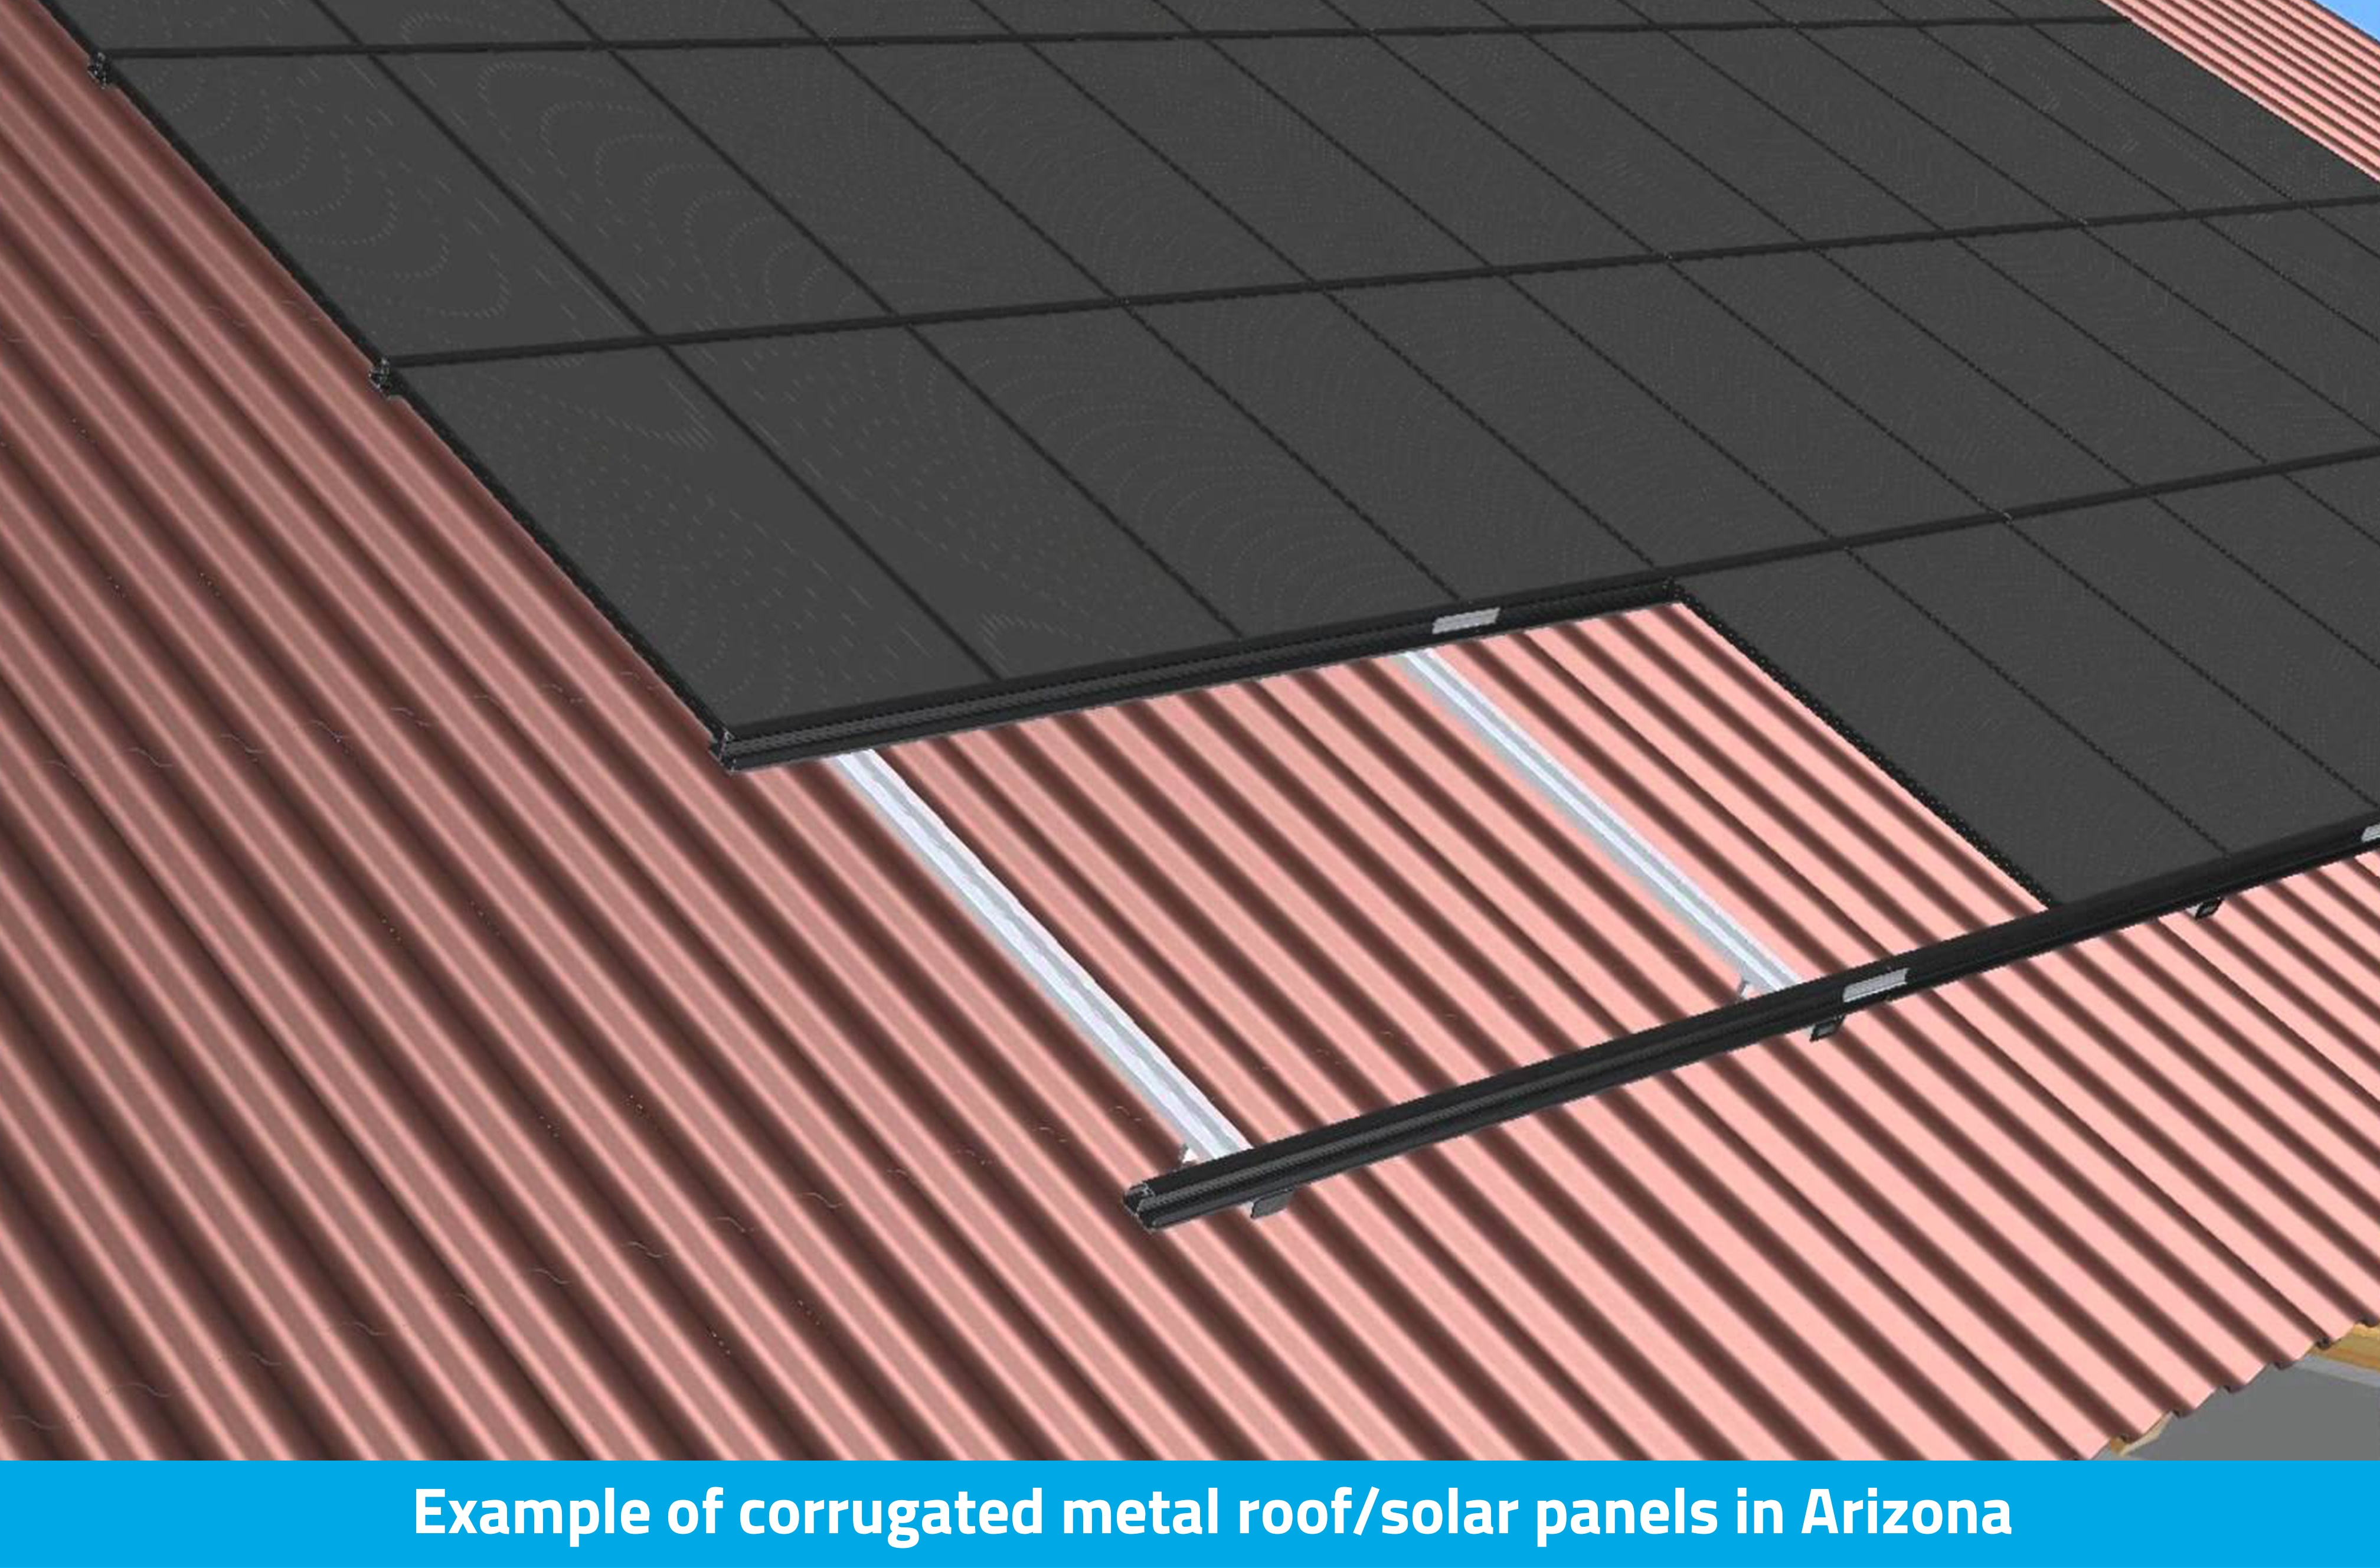 corrugated-metal-roof-in-arizona.jpg